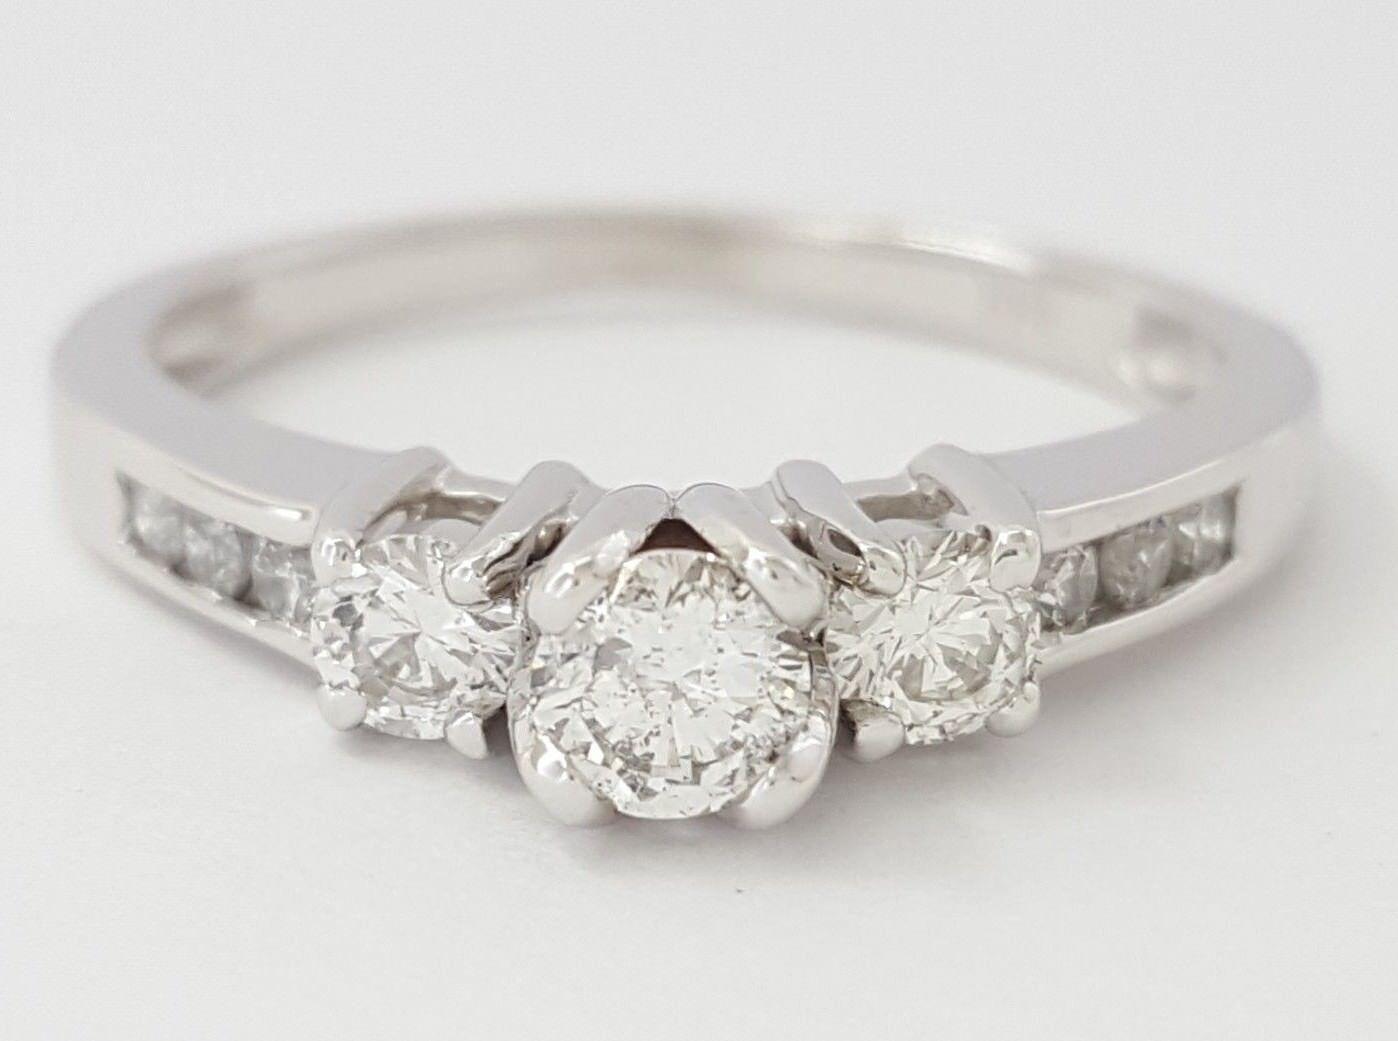 0.44 ct 14k White gold Three Stone Round Brilliant Cut Diamond Engagement Ring